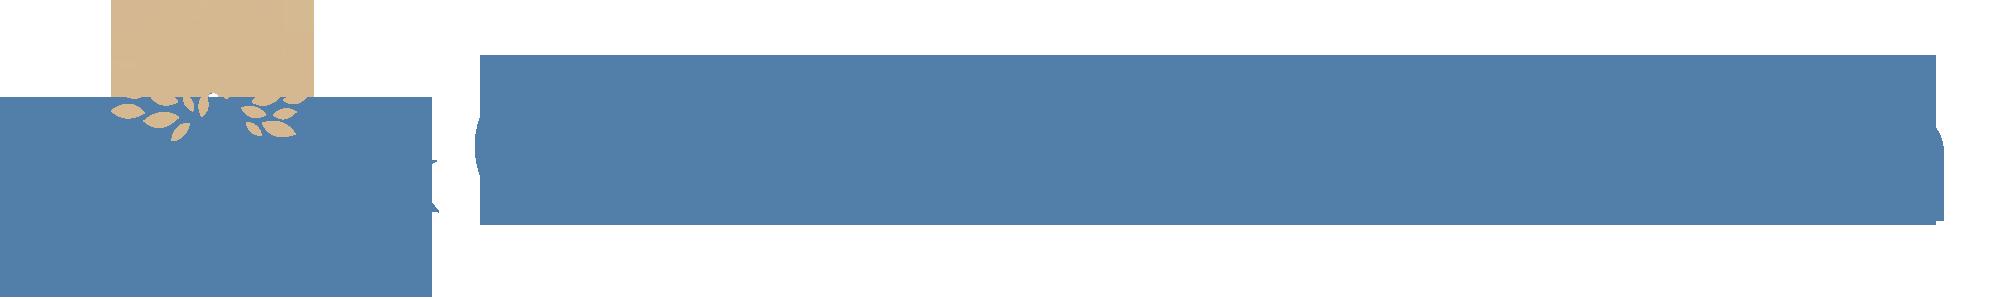 https://bookmarkreads.ca/i/168583x/logo_navbar.png